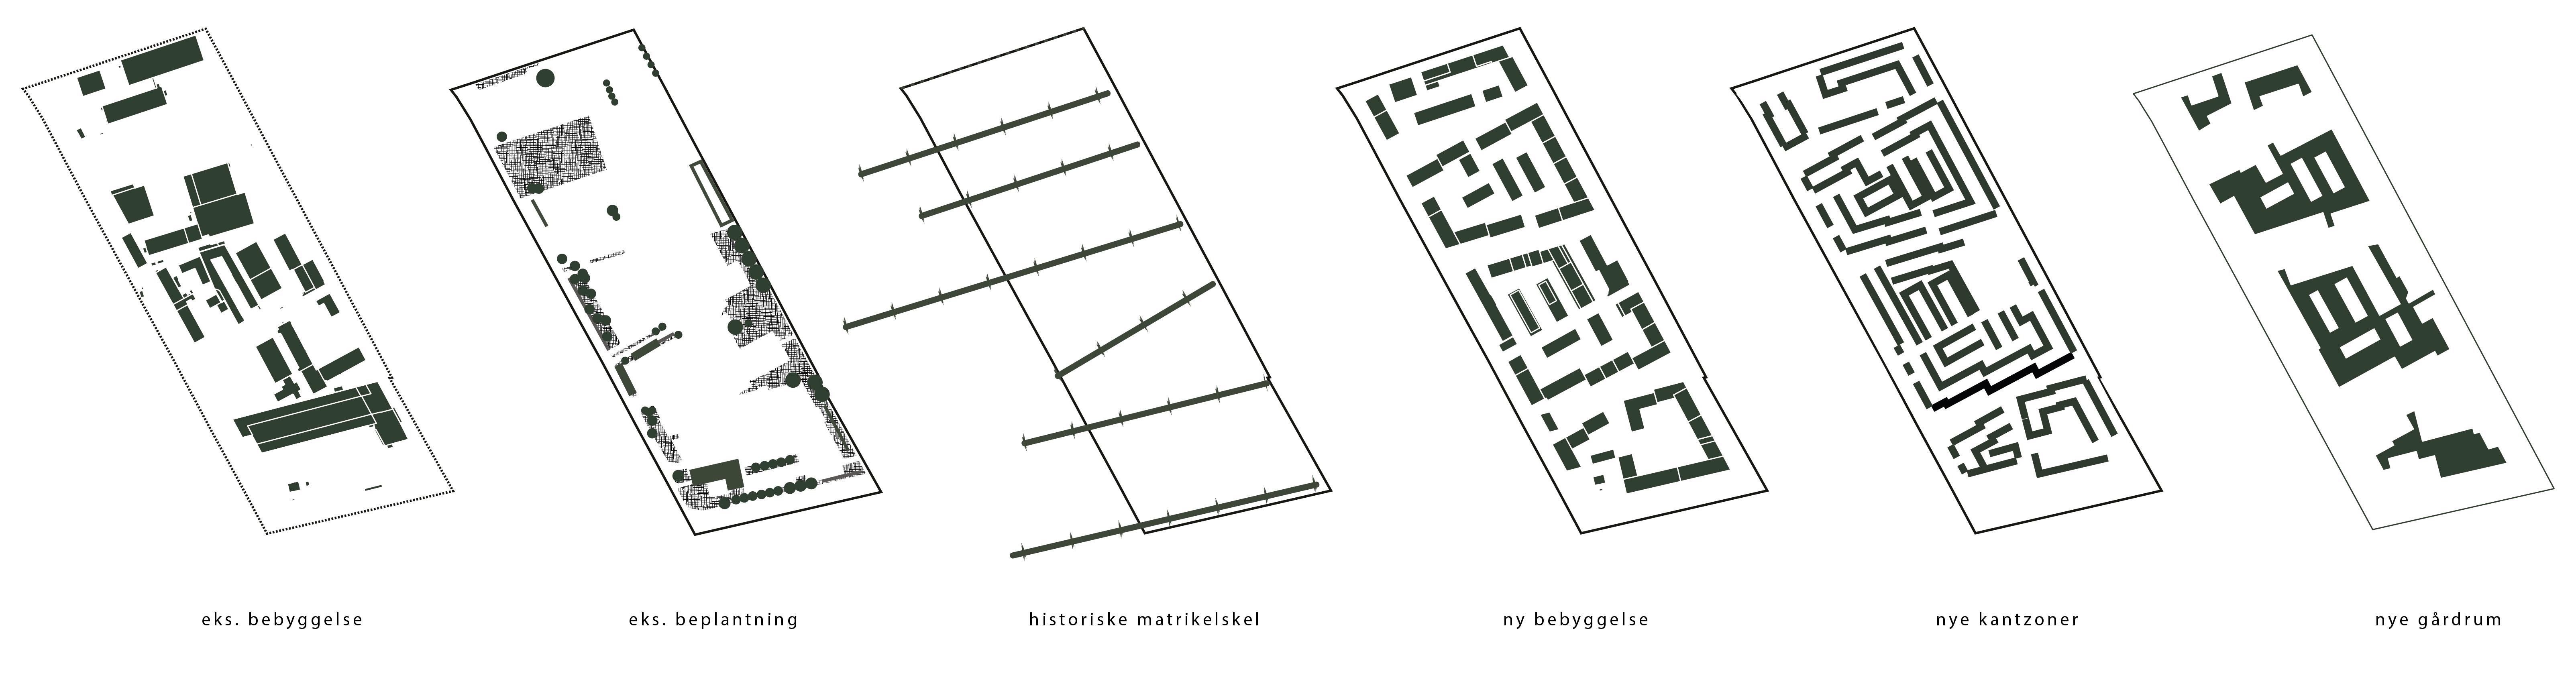 vabs-diagrammer-01